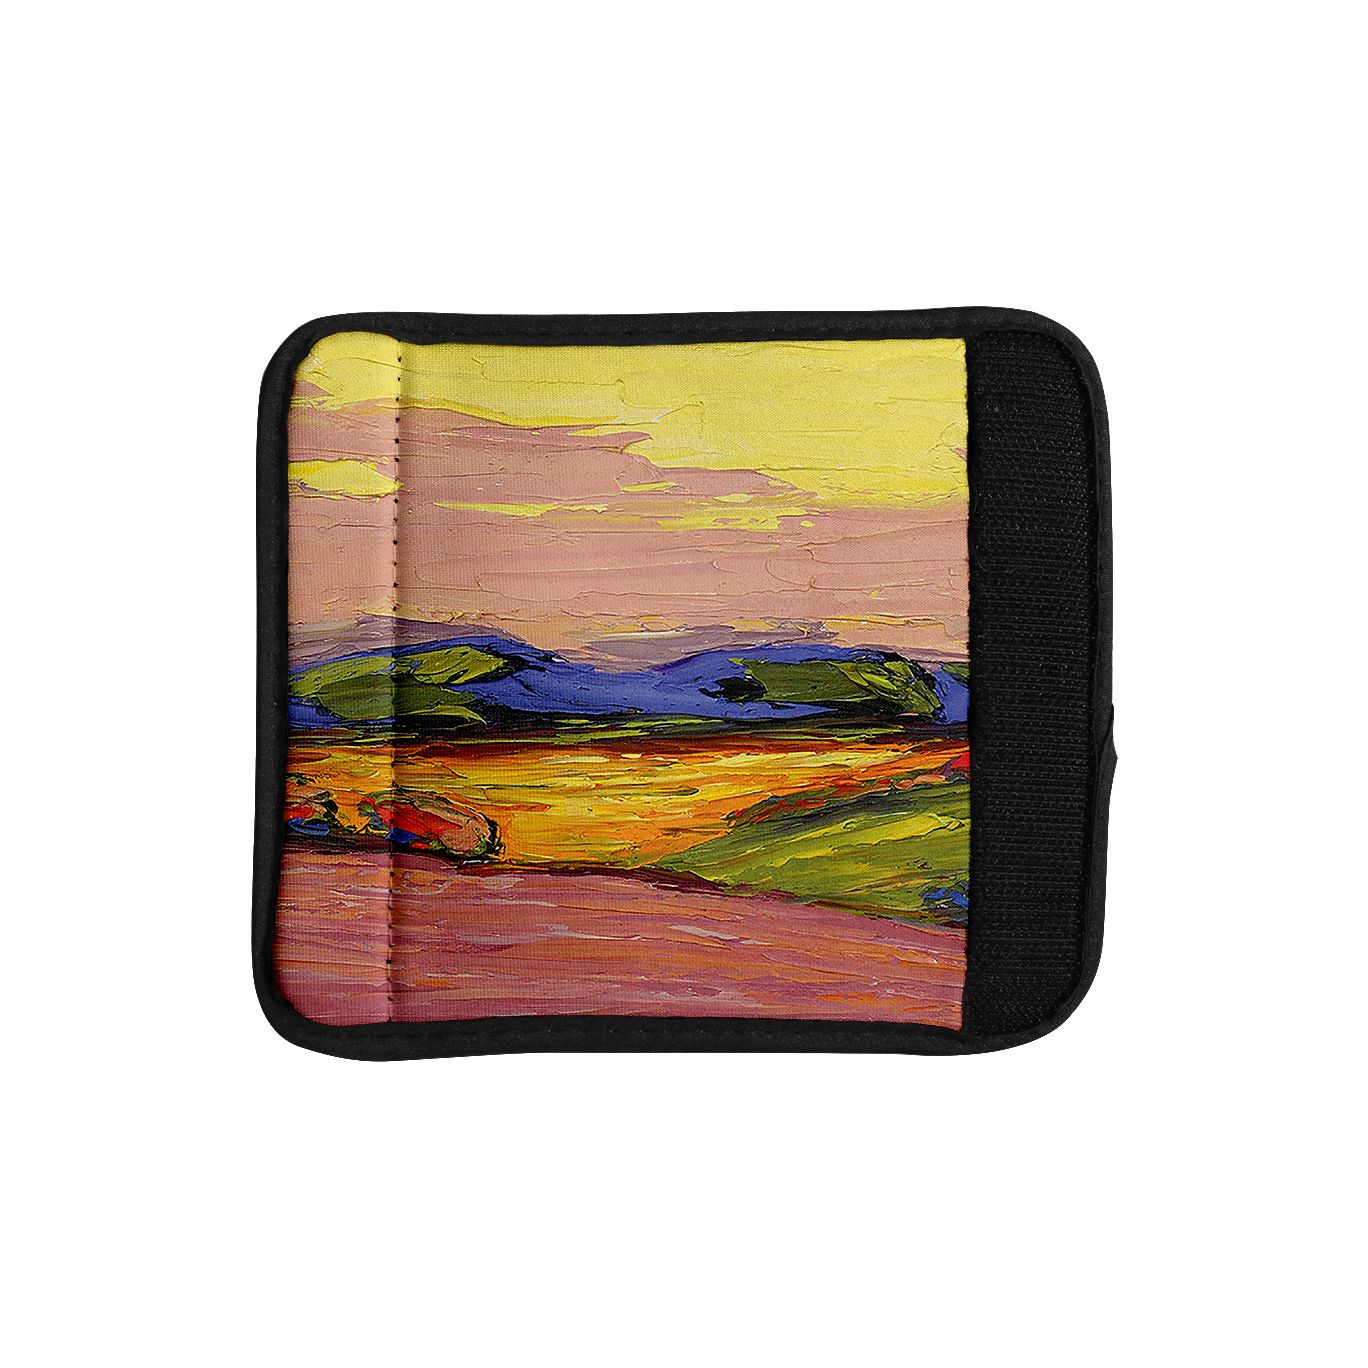 Kess InHouse Jeff Ferst 'Pastoral View' color Painting Luggage Handle Wrap